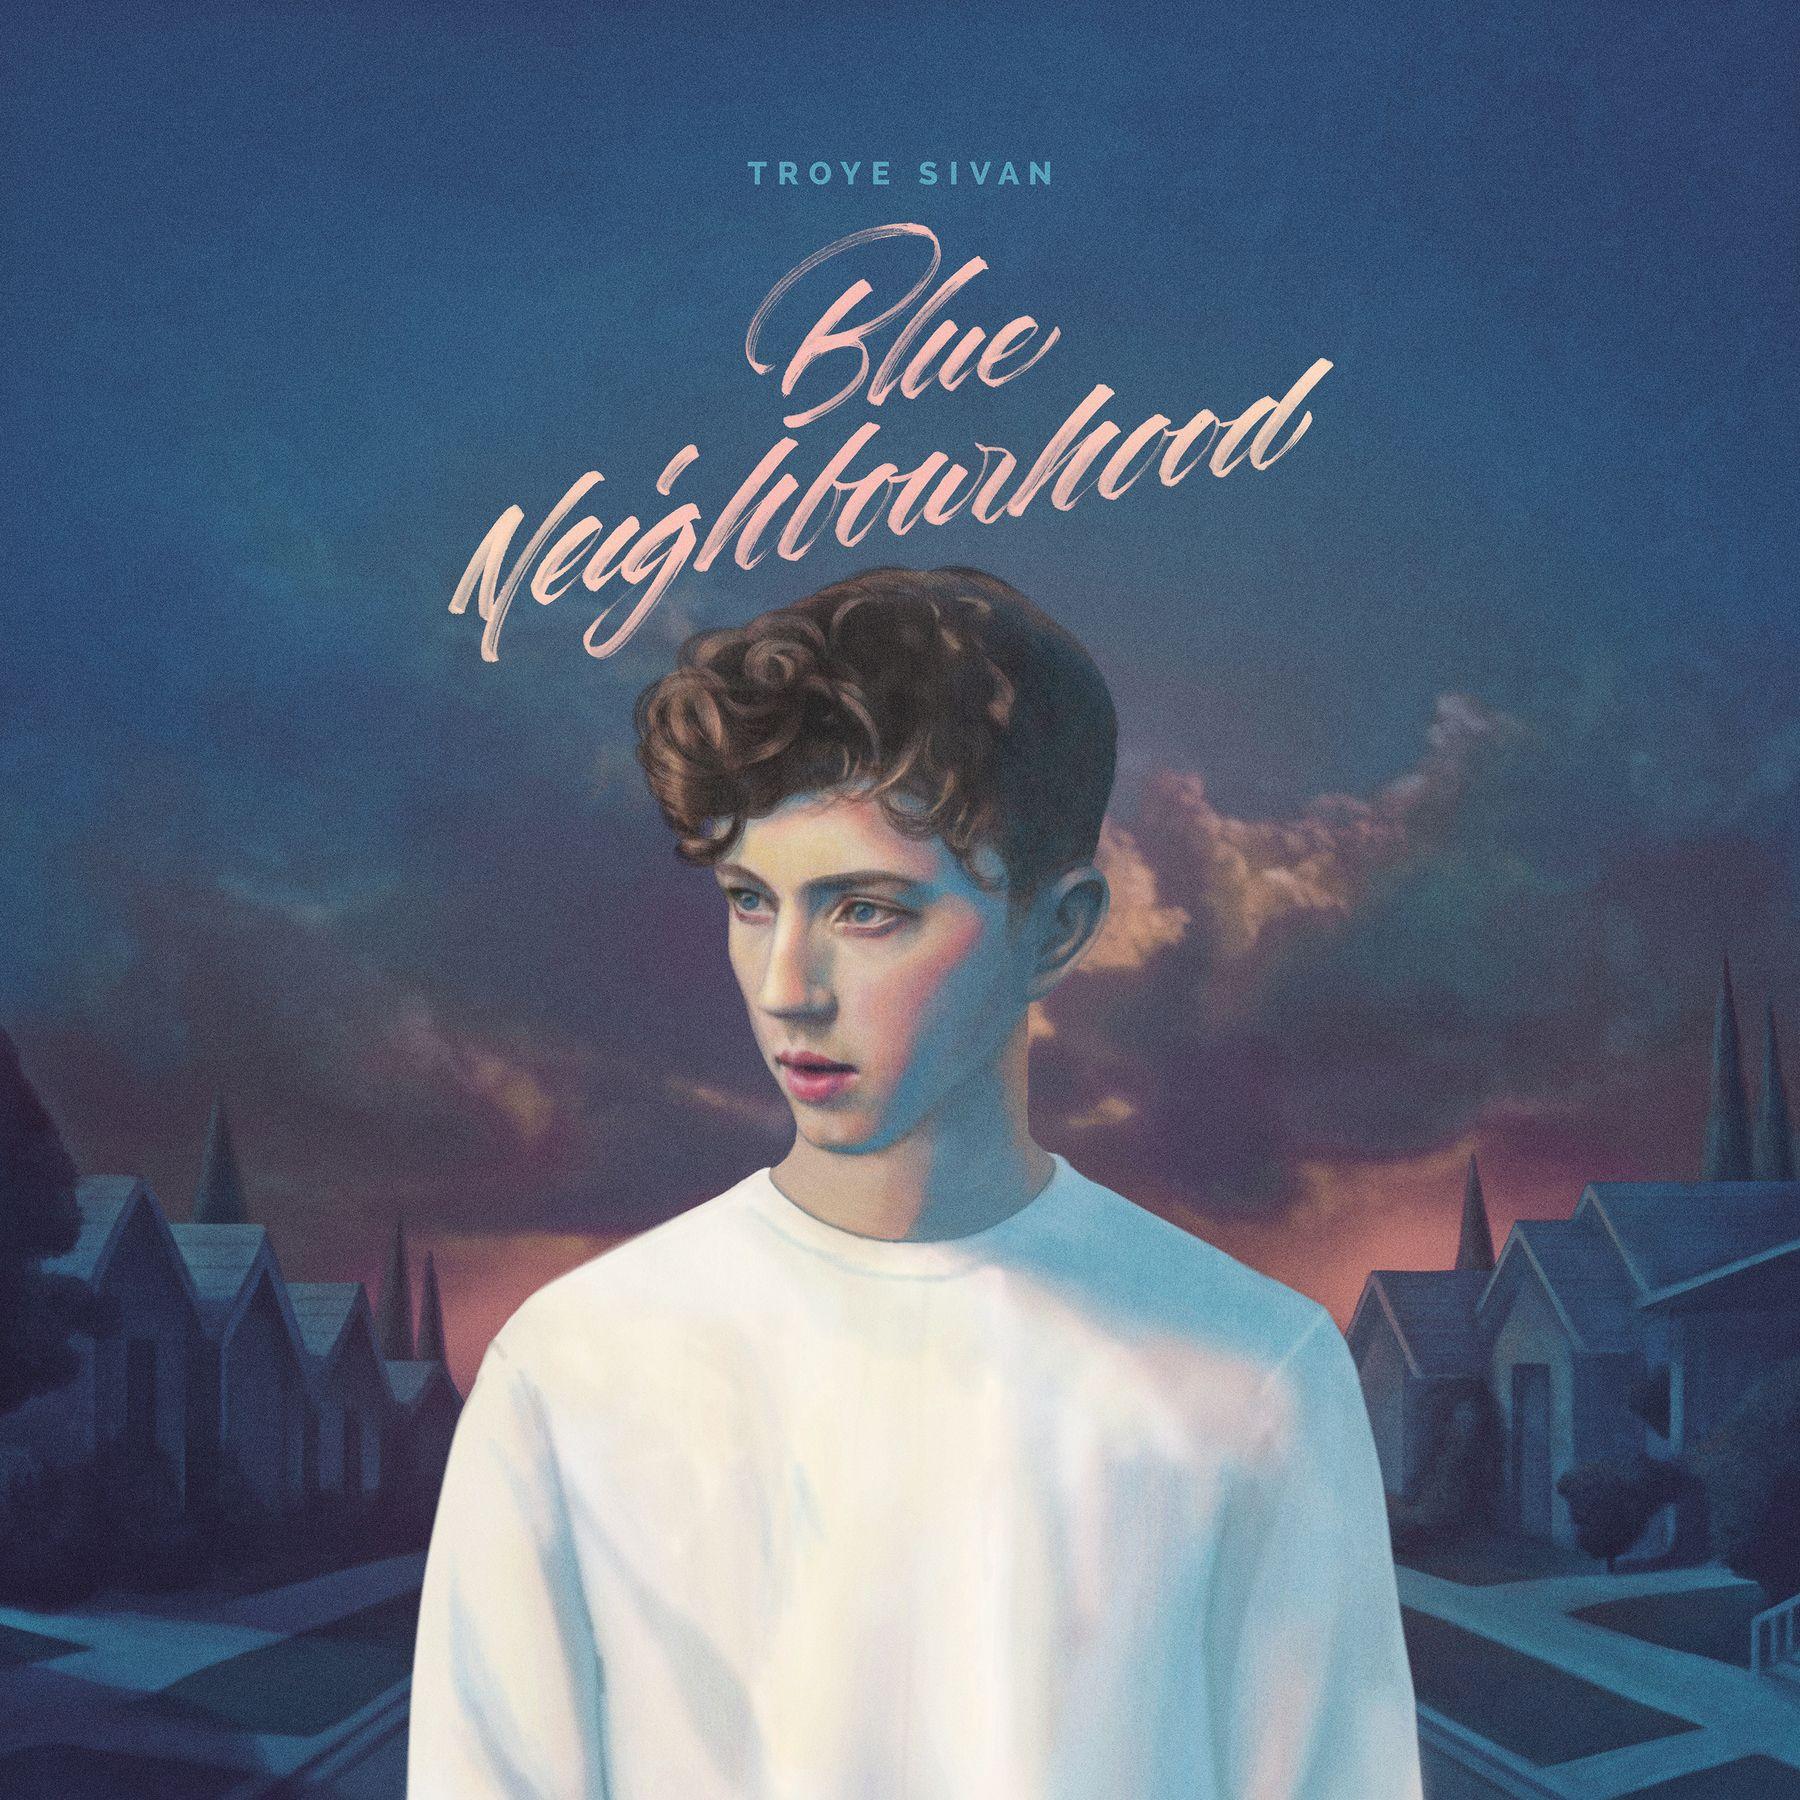 Troye Sivan - Blue Neighbourhood album cover